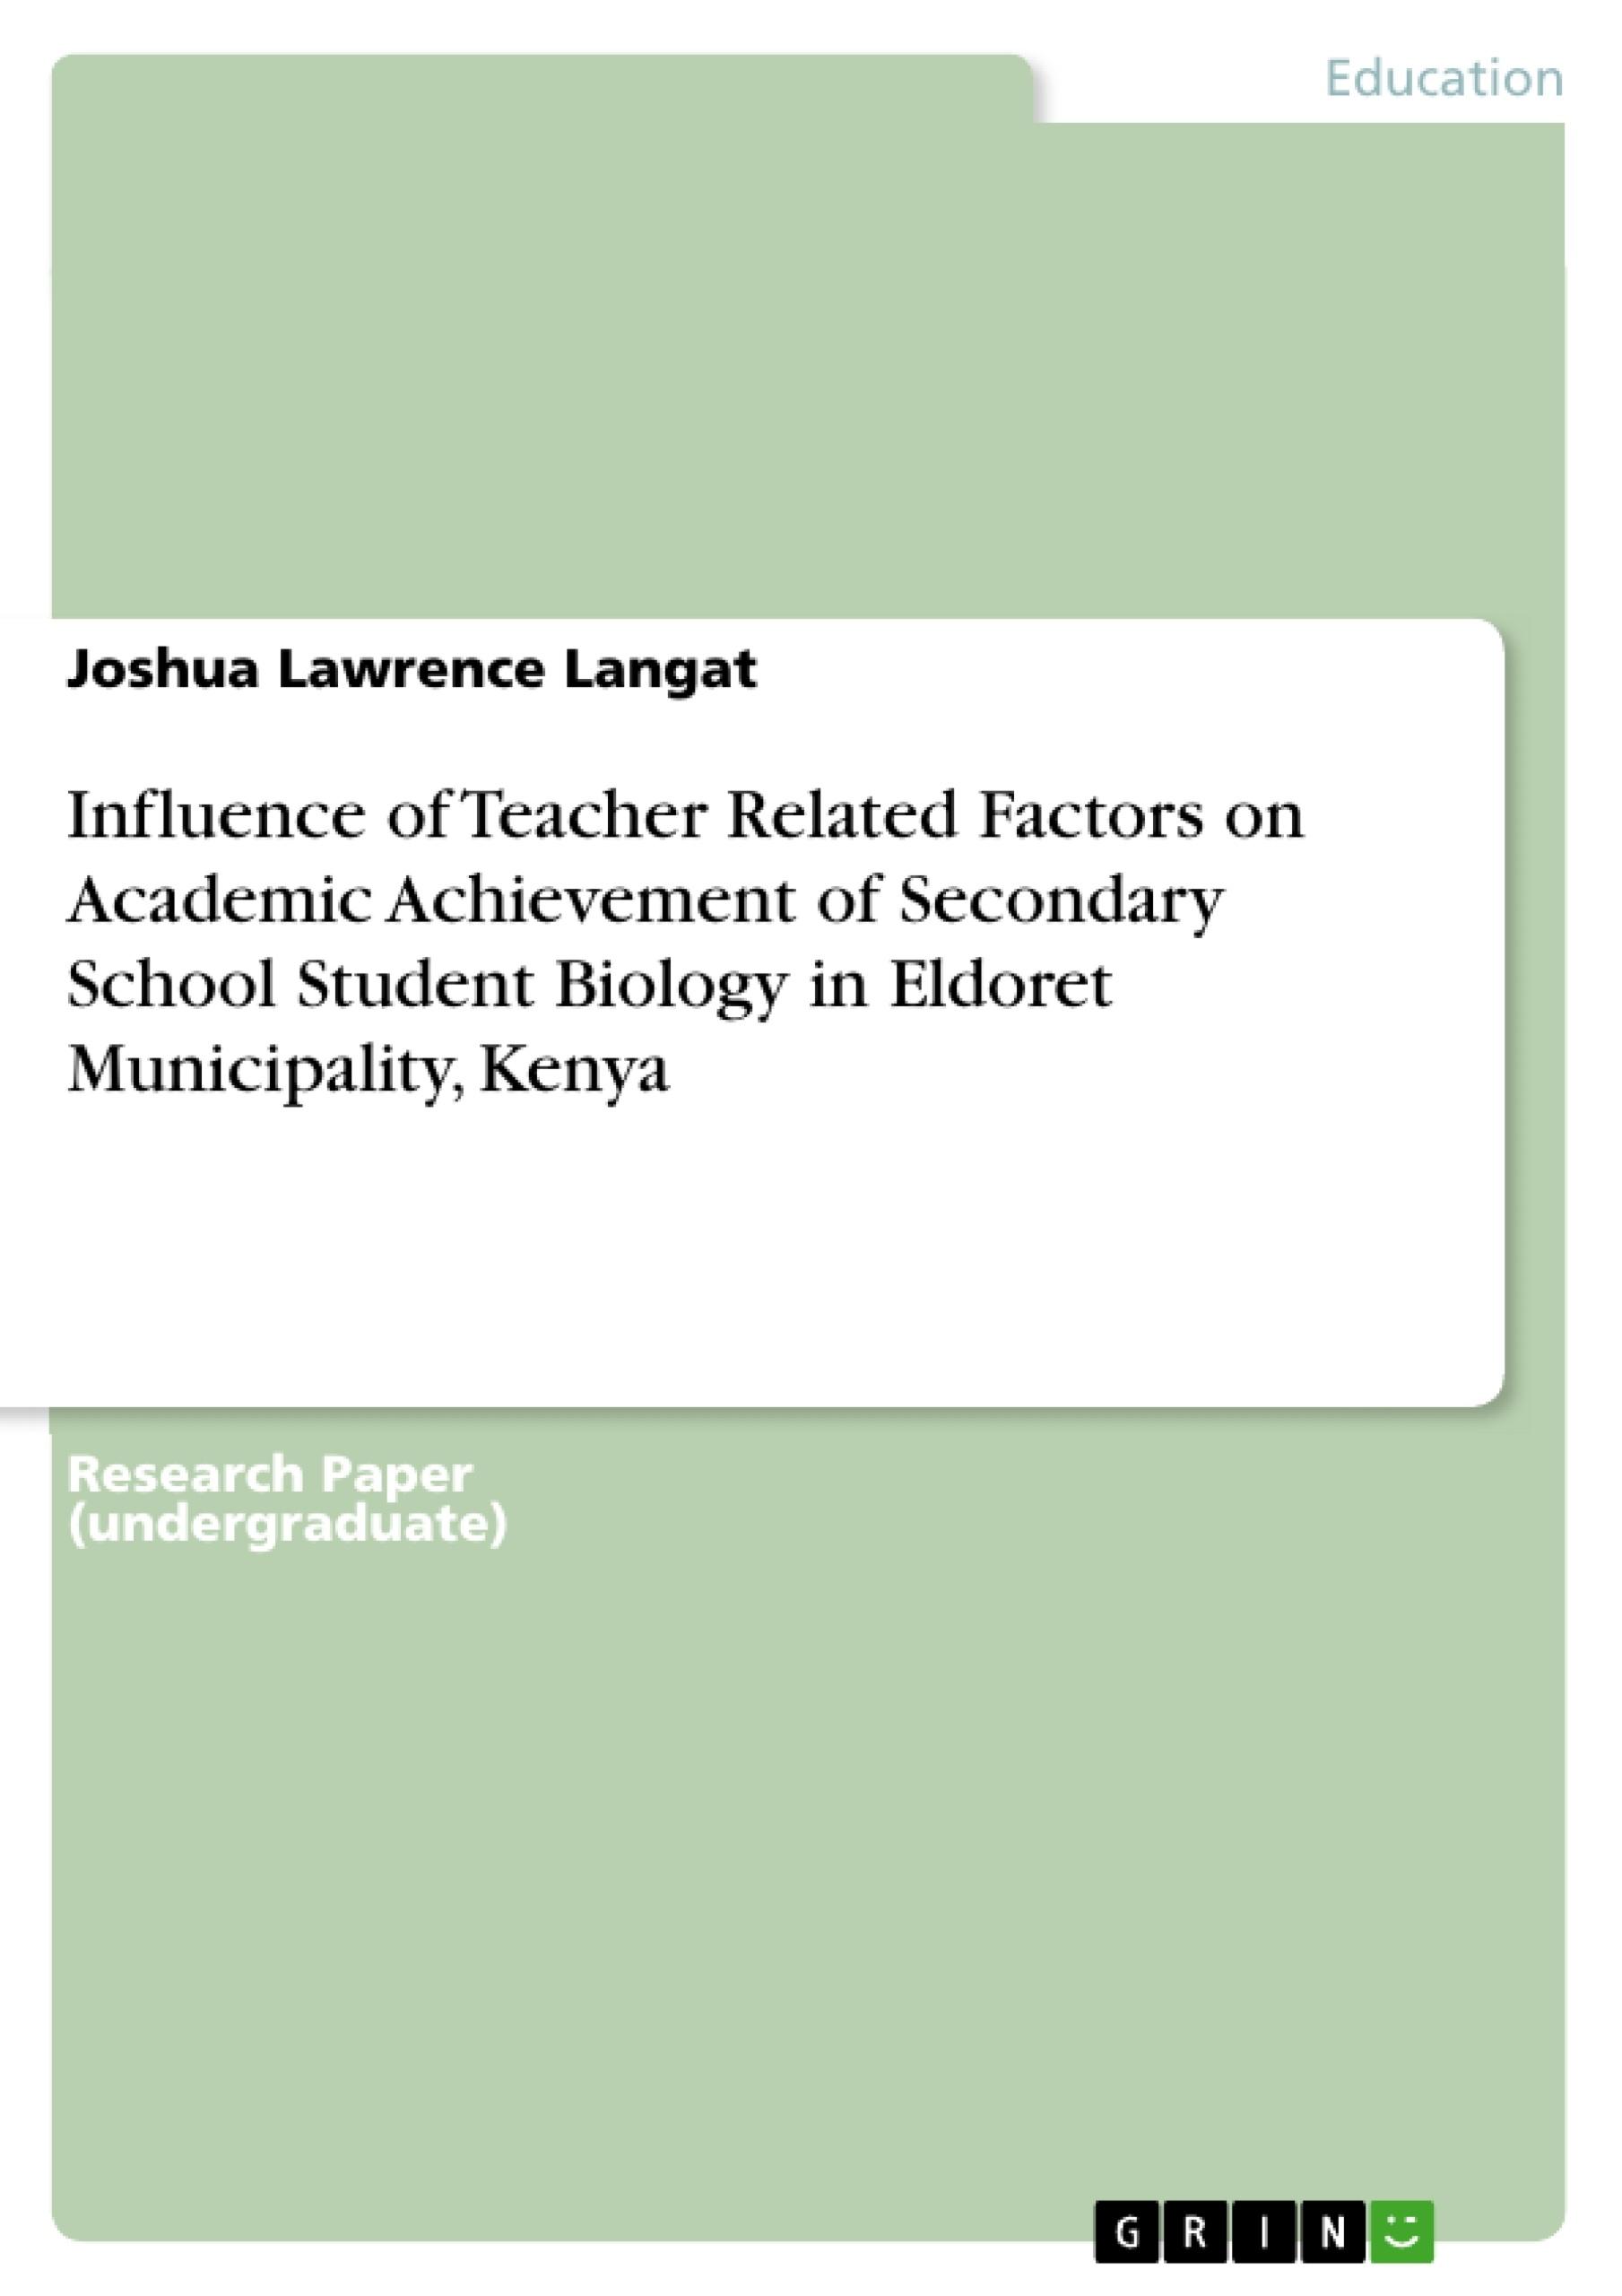 Title: Influence of Teacher Related Factors on Academic Achievement of Secondary School Student Biology in Eldoret Municipality, Kenya